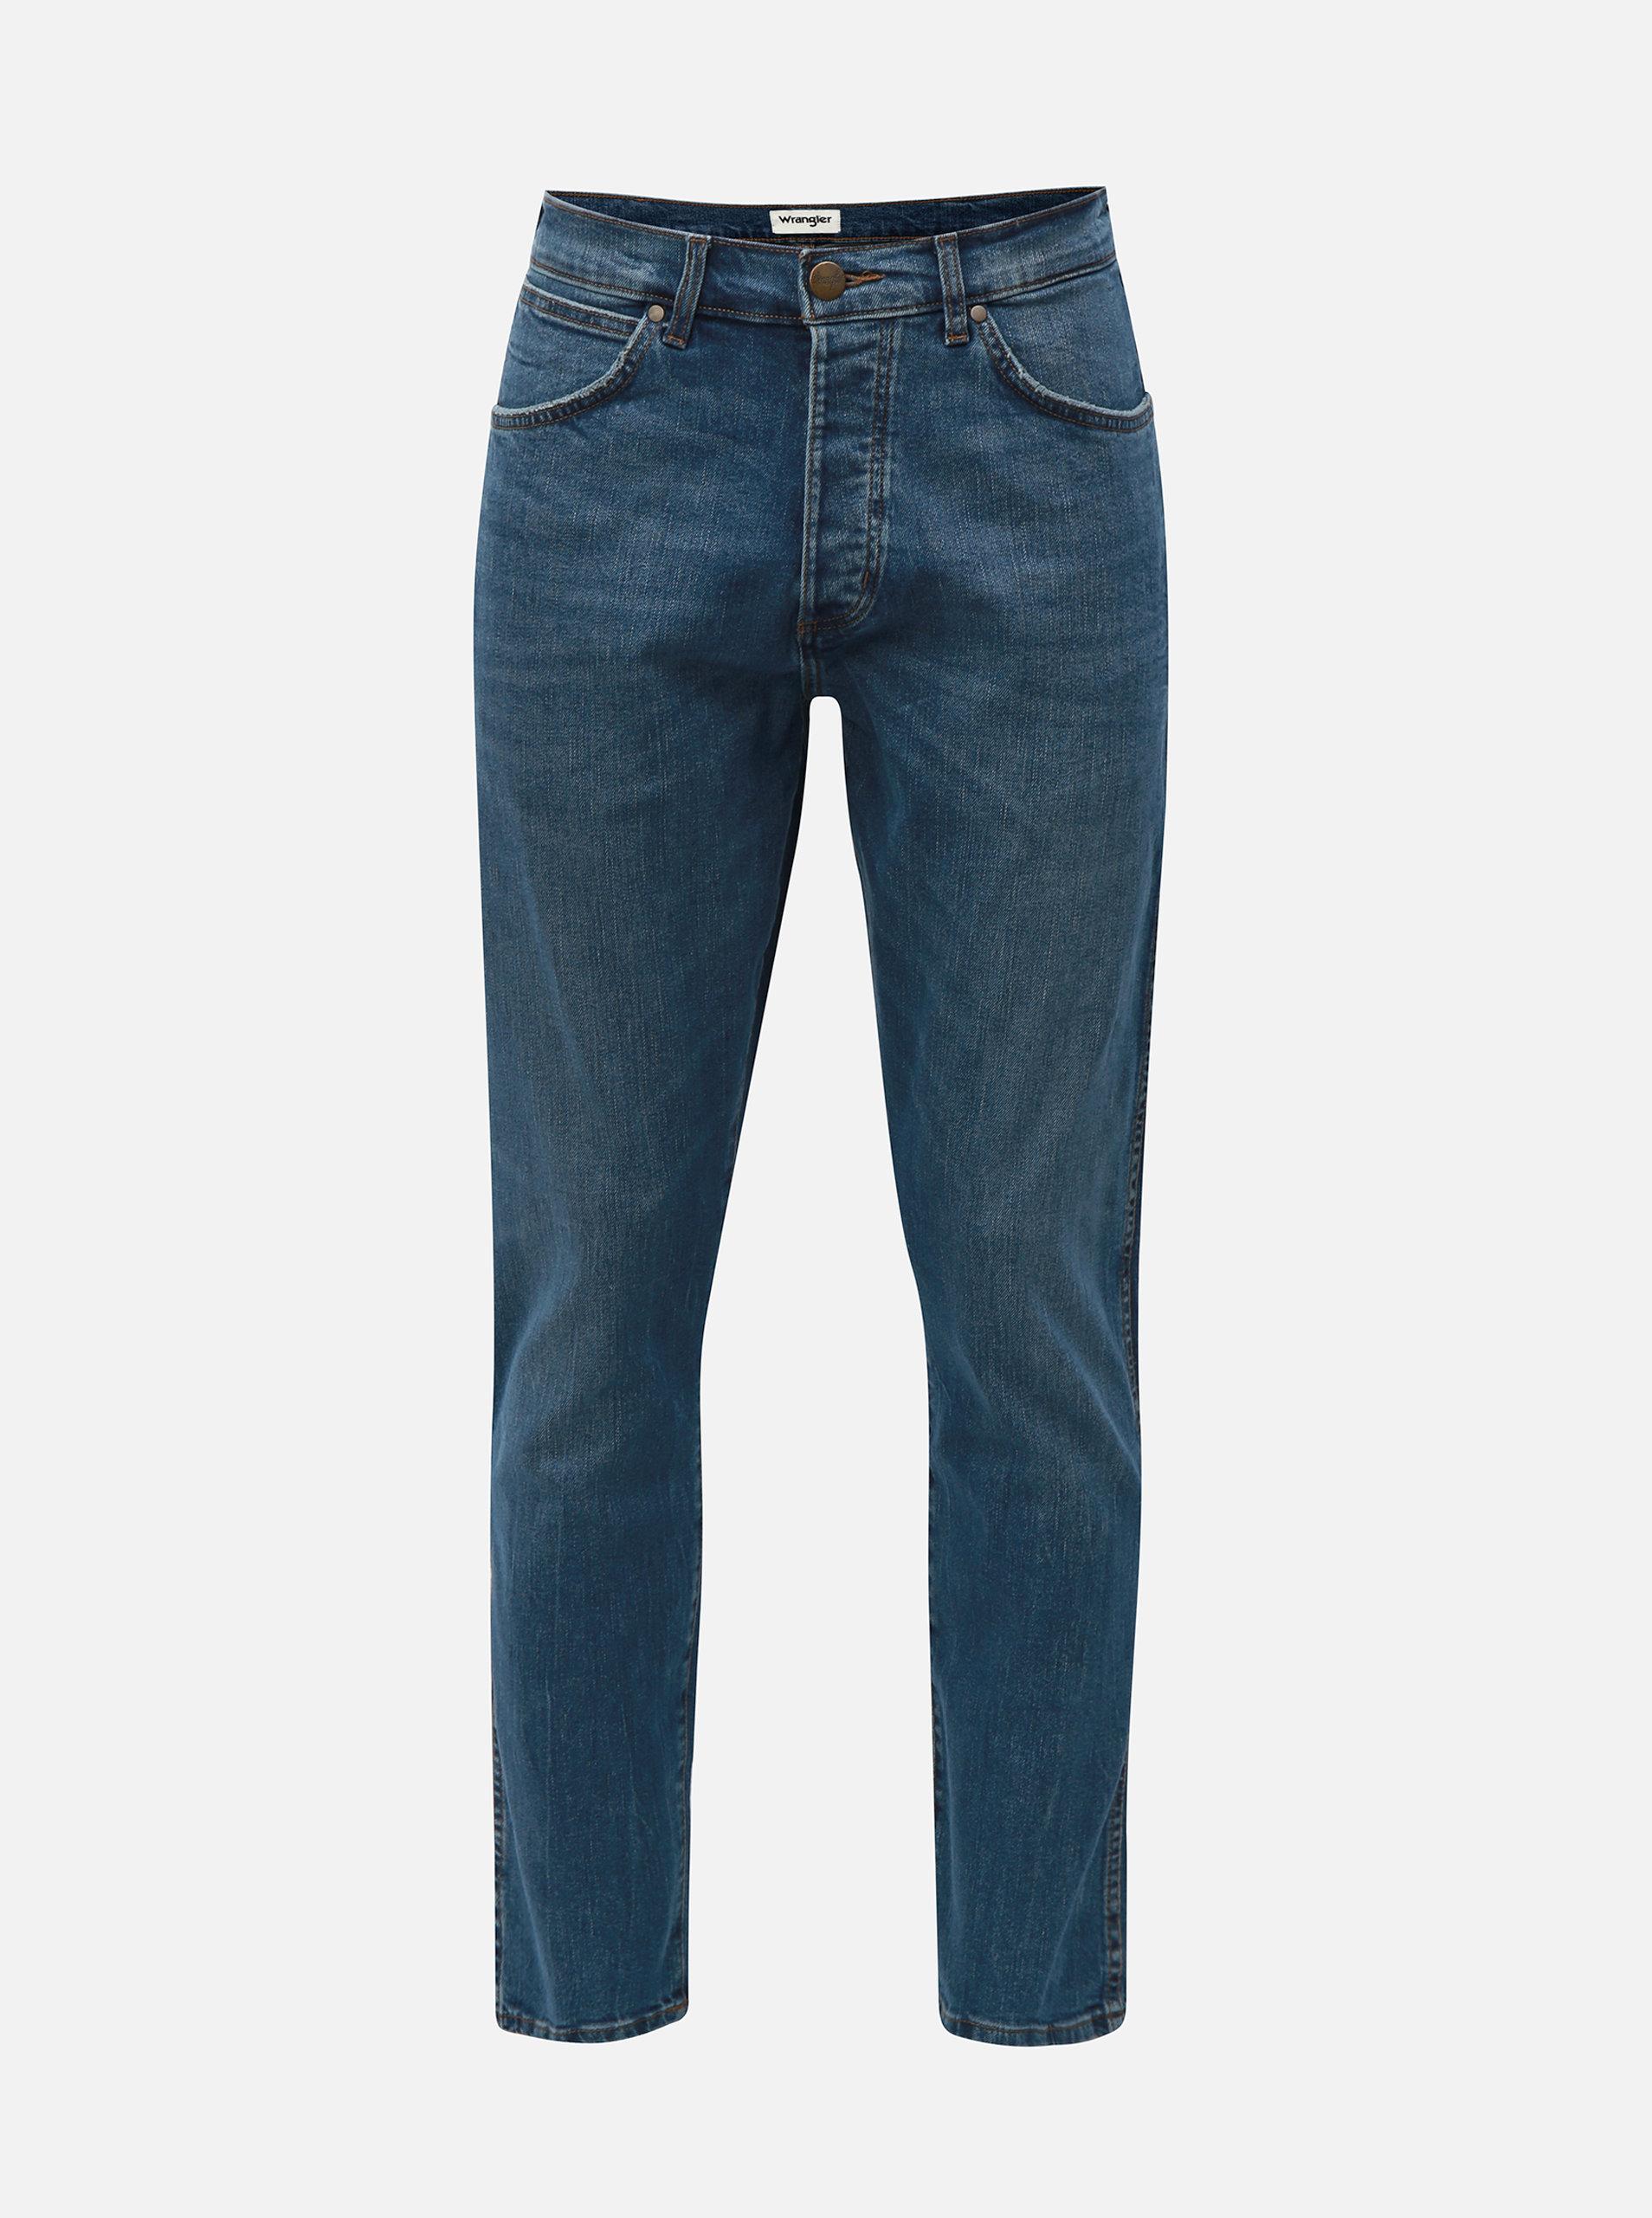 a12ea41f902 Modré pánské džíny Wrangler ...